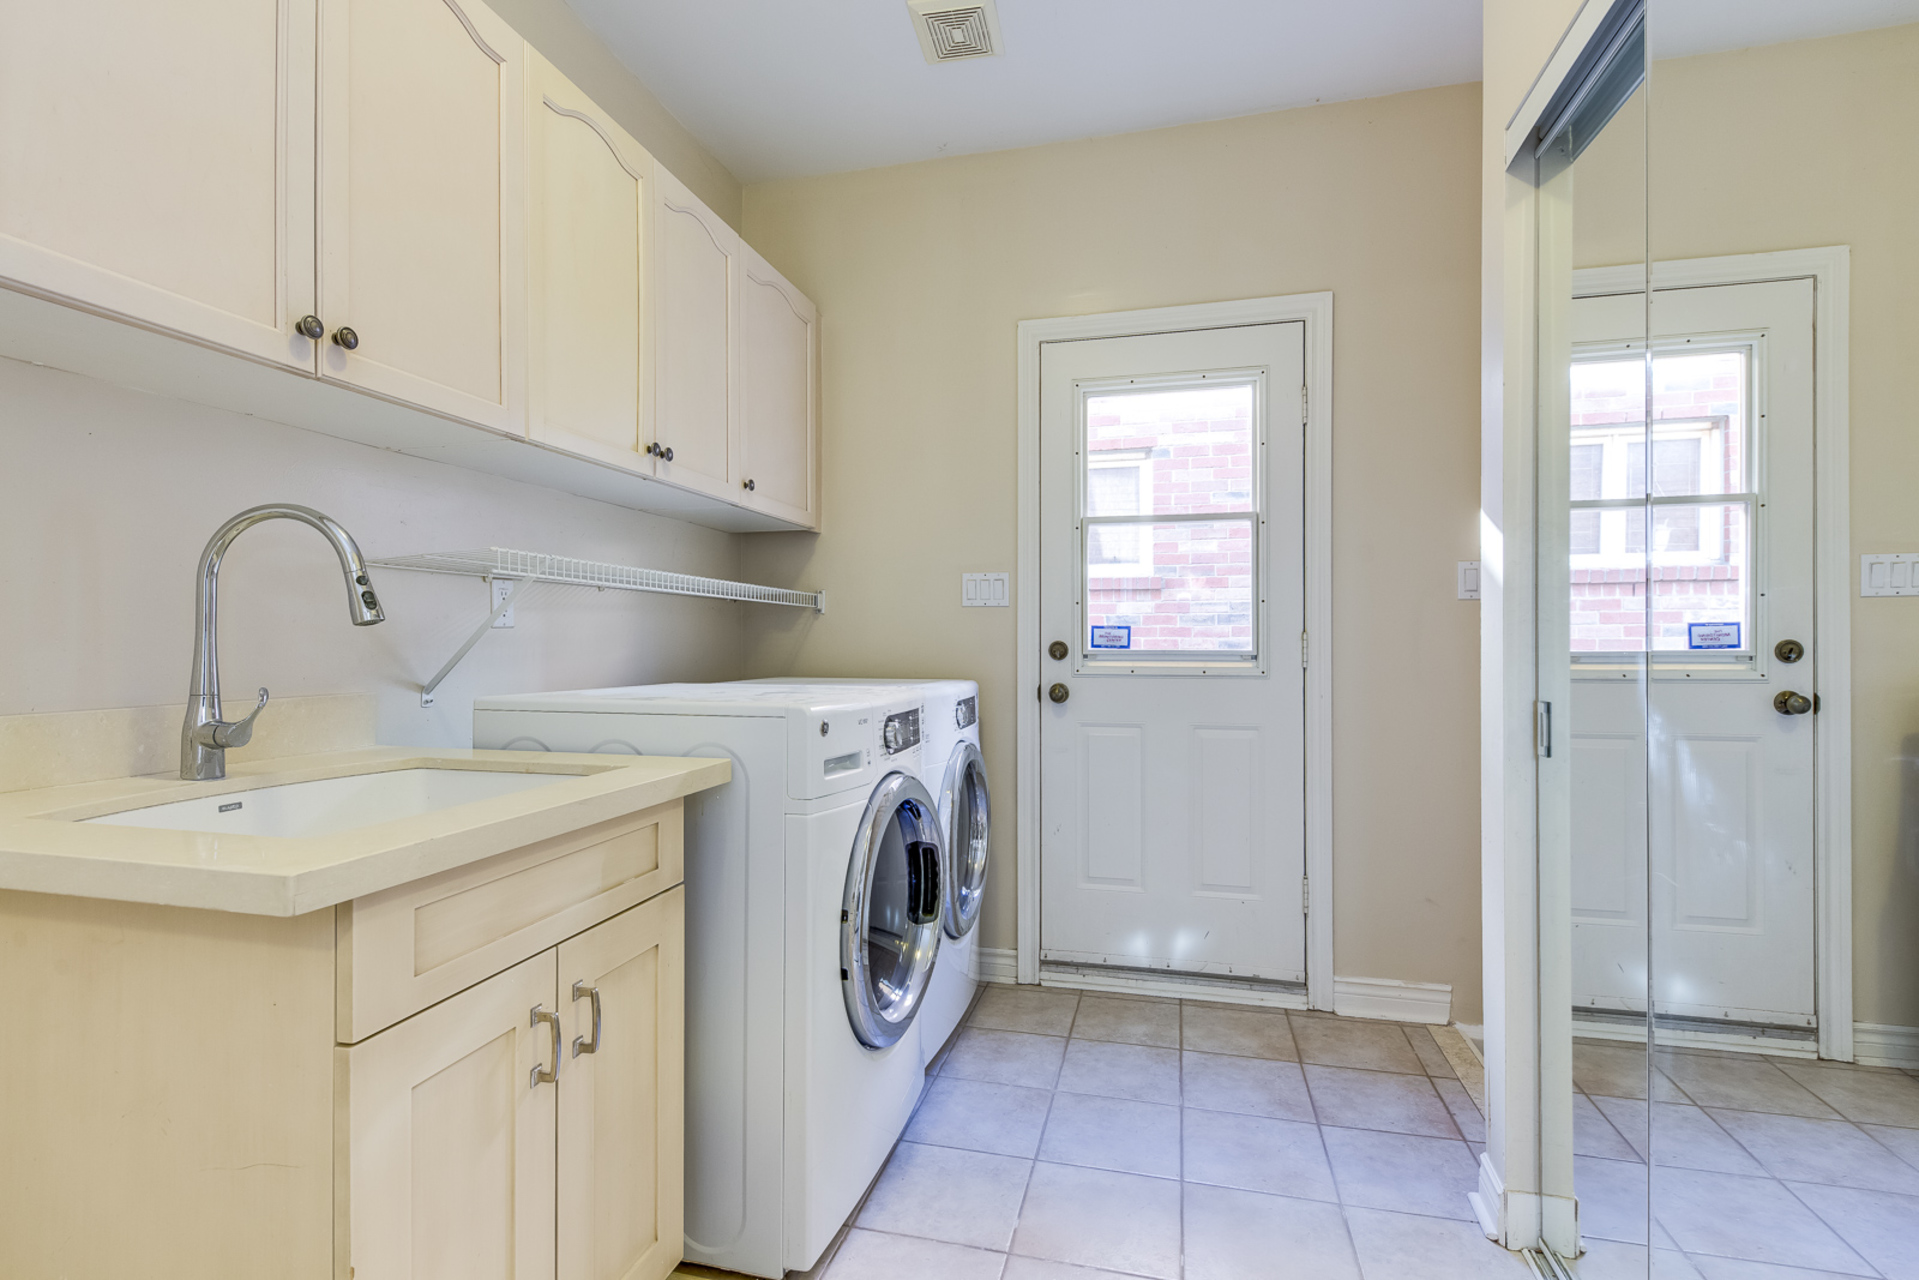 Laundry Room - 1806 Glenvista Dr, Oakville - Elite3 & Team at  Glenvista Drive, Iroquois Ridge North, Oakville